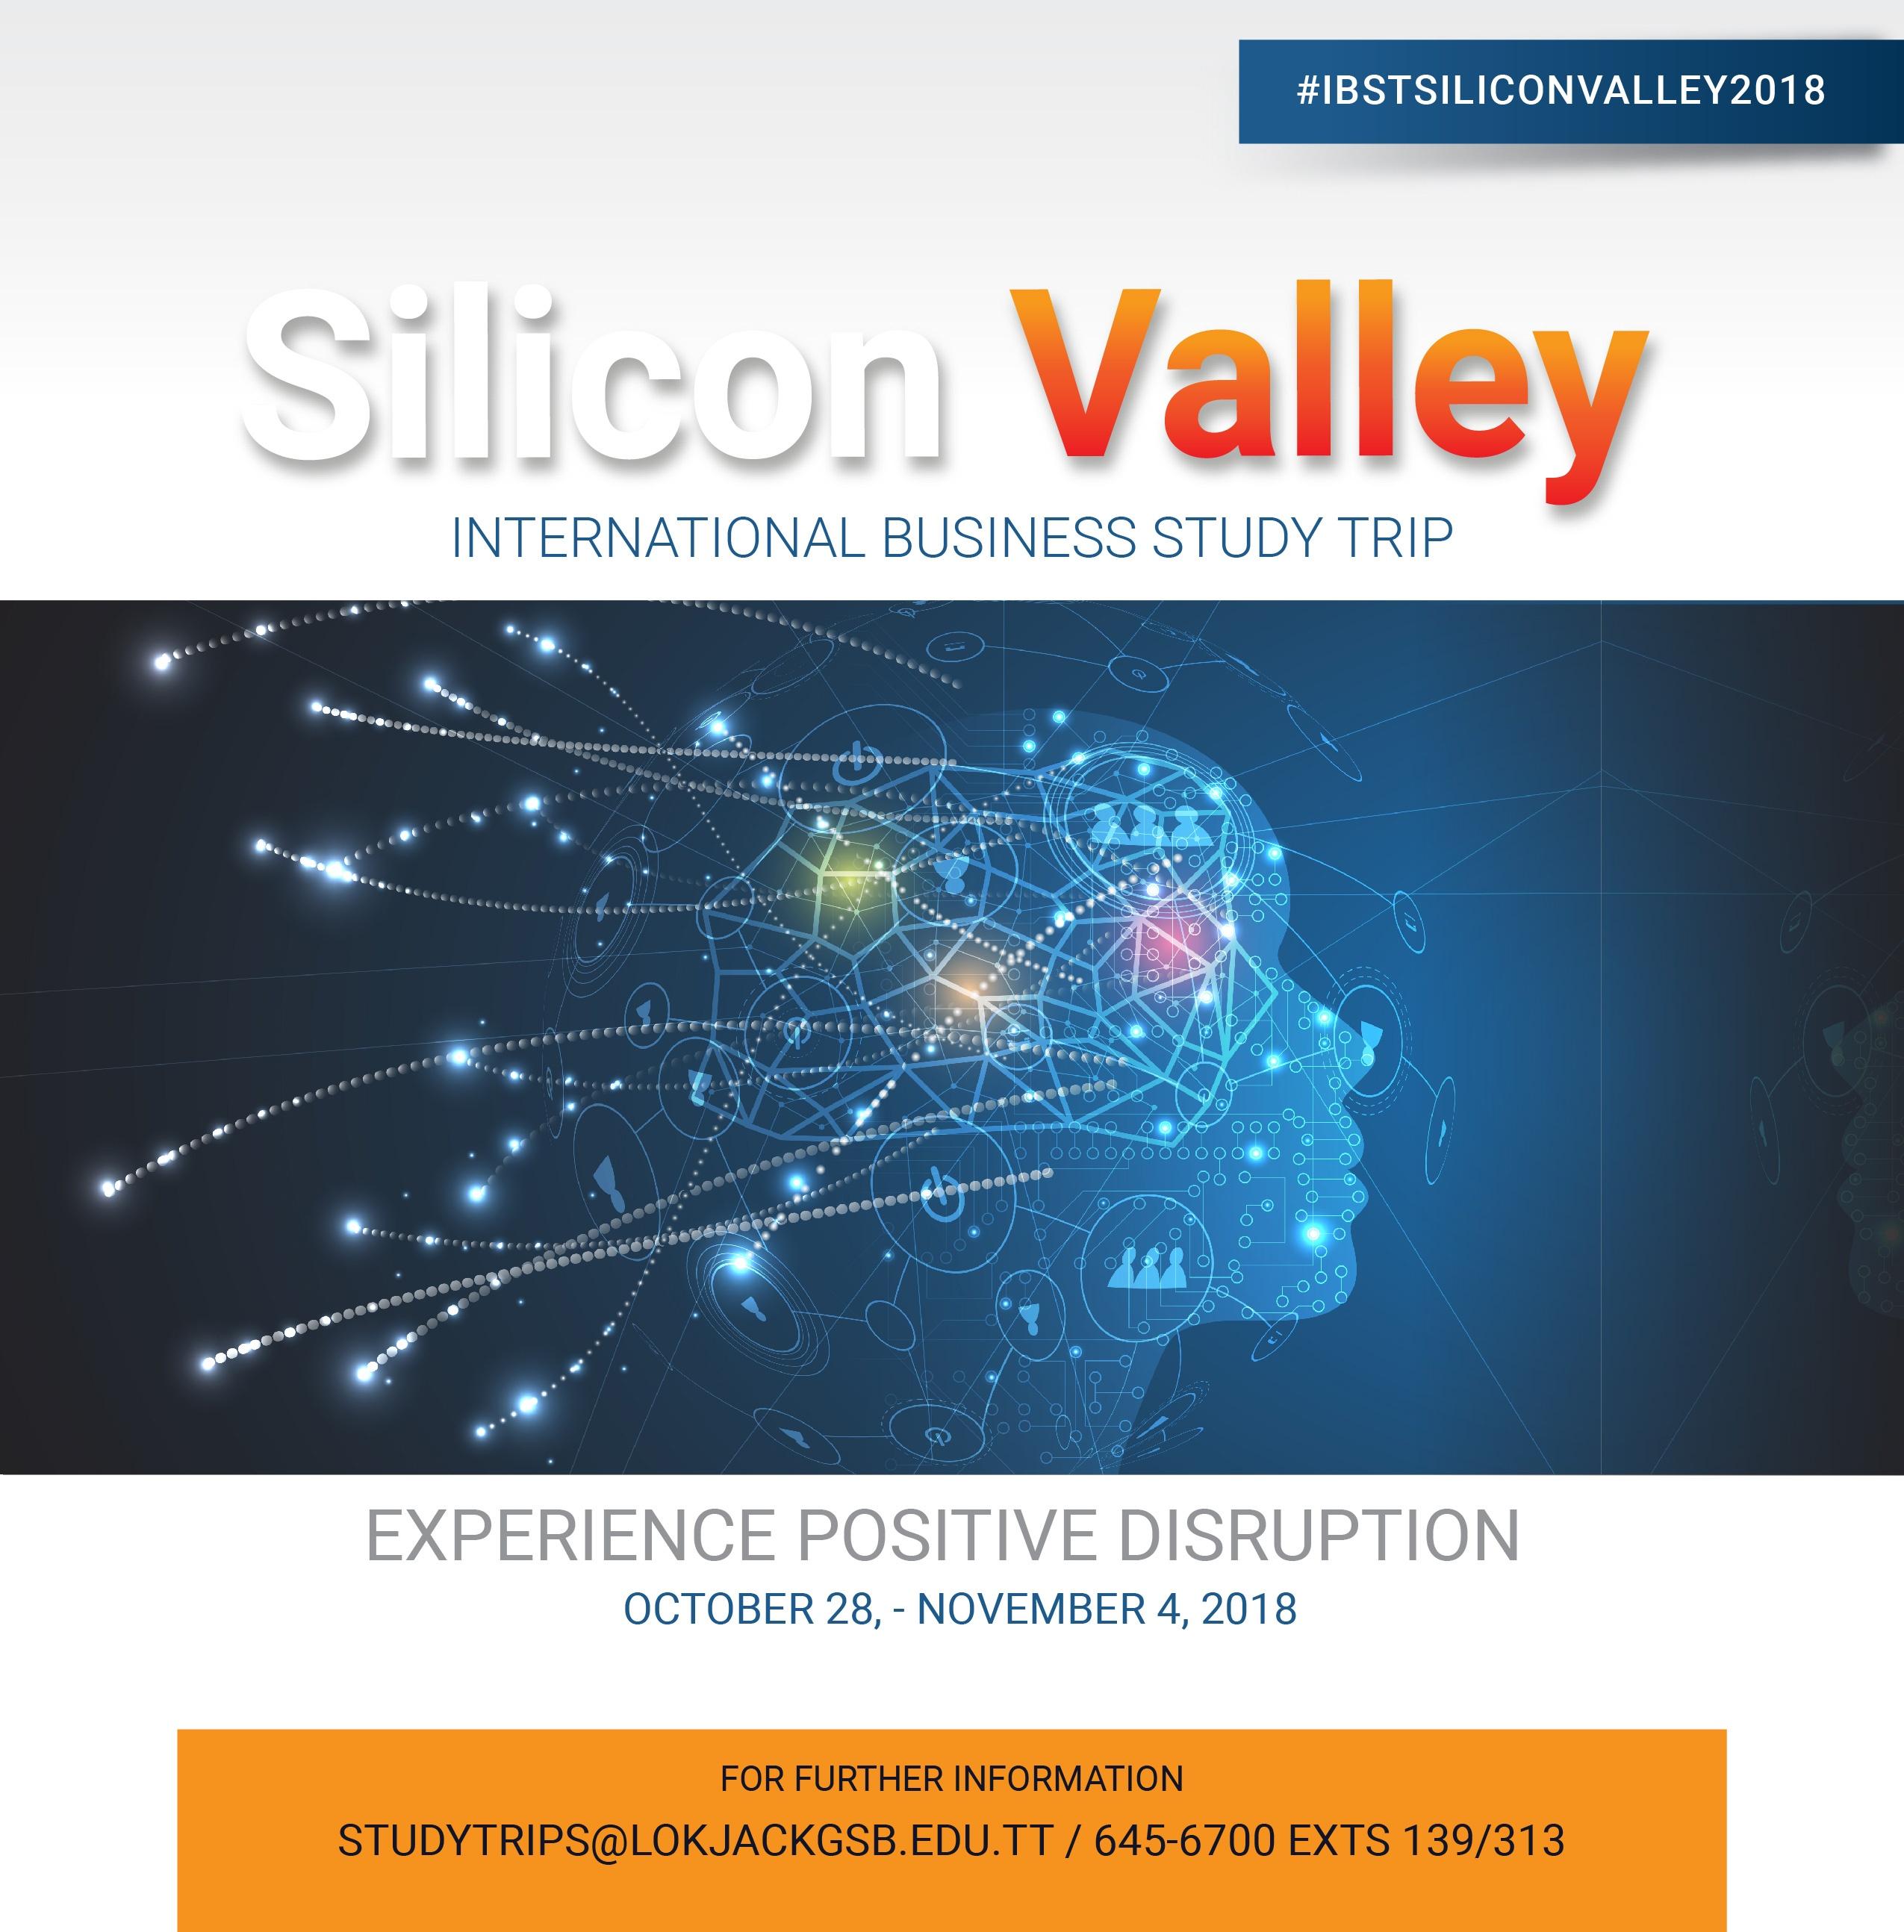 Silicon Valley eshot revised-01 (002)-1